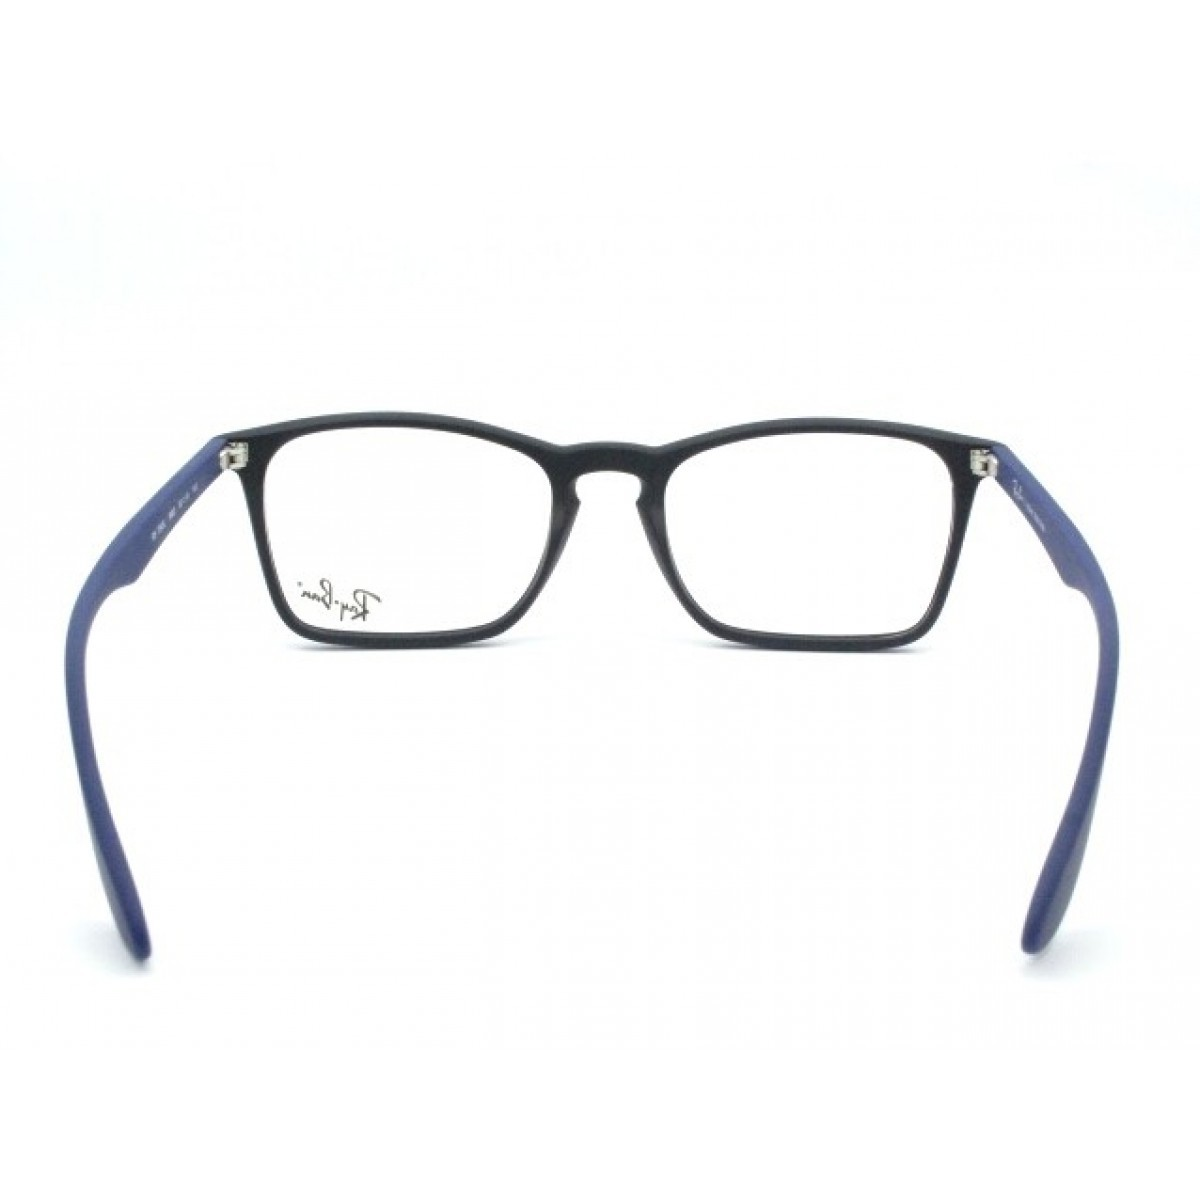 RAY-BAN RB7045L - Preto/Azul Fosco - 5663 55-18 145